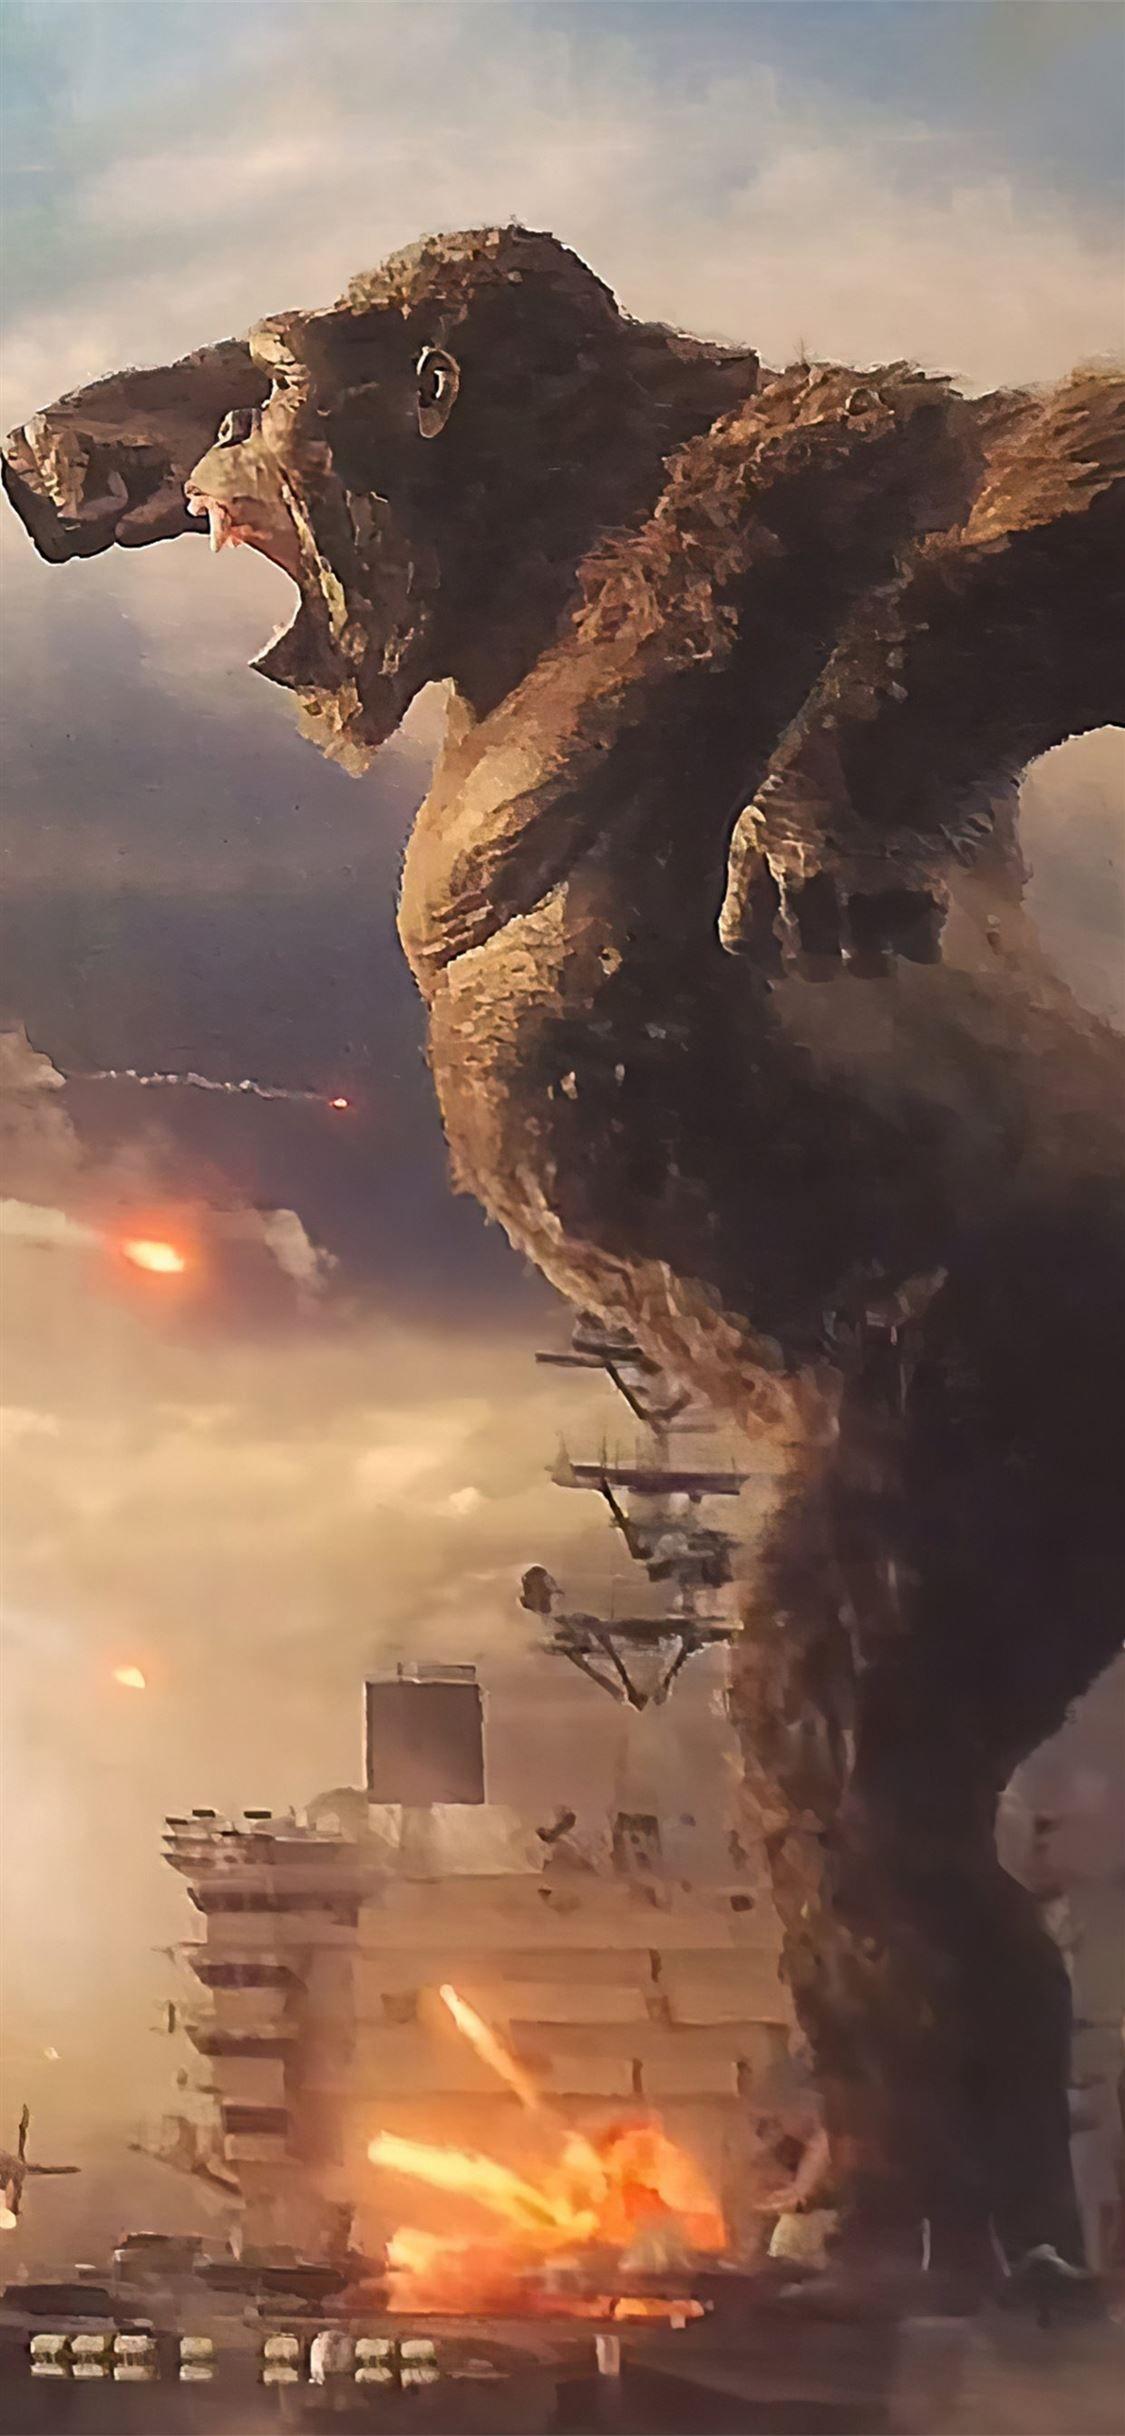 43+ Godzilla wallpaper iphone high quality